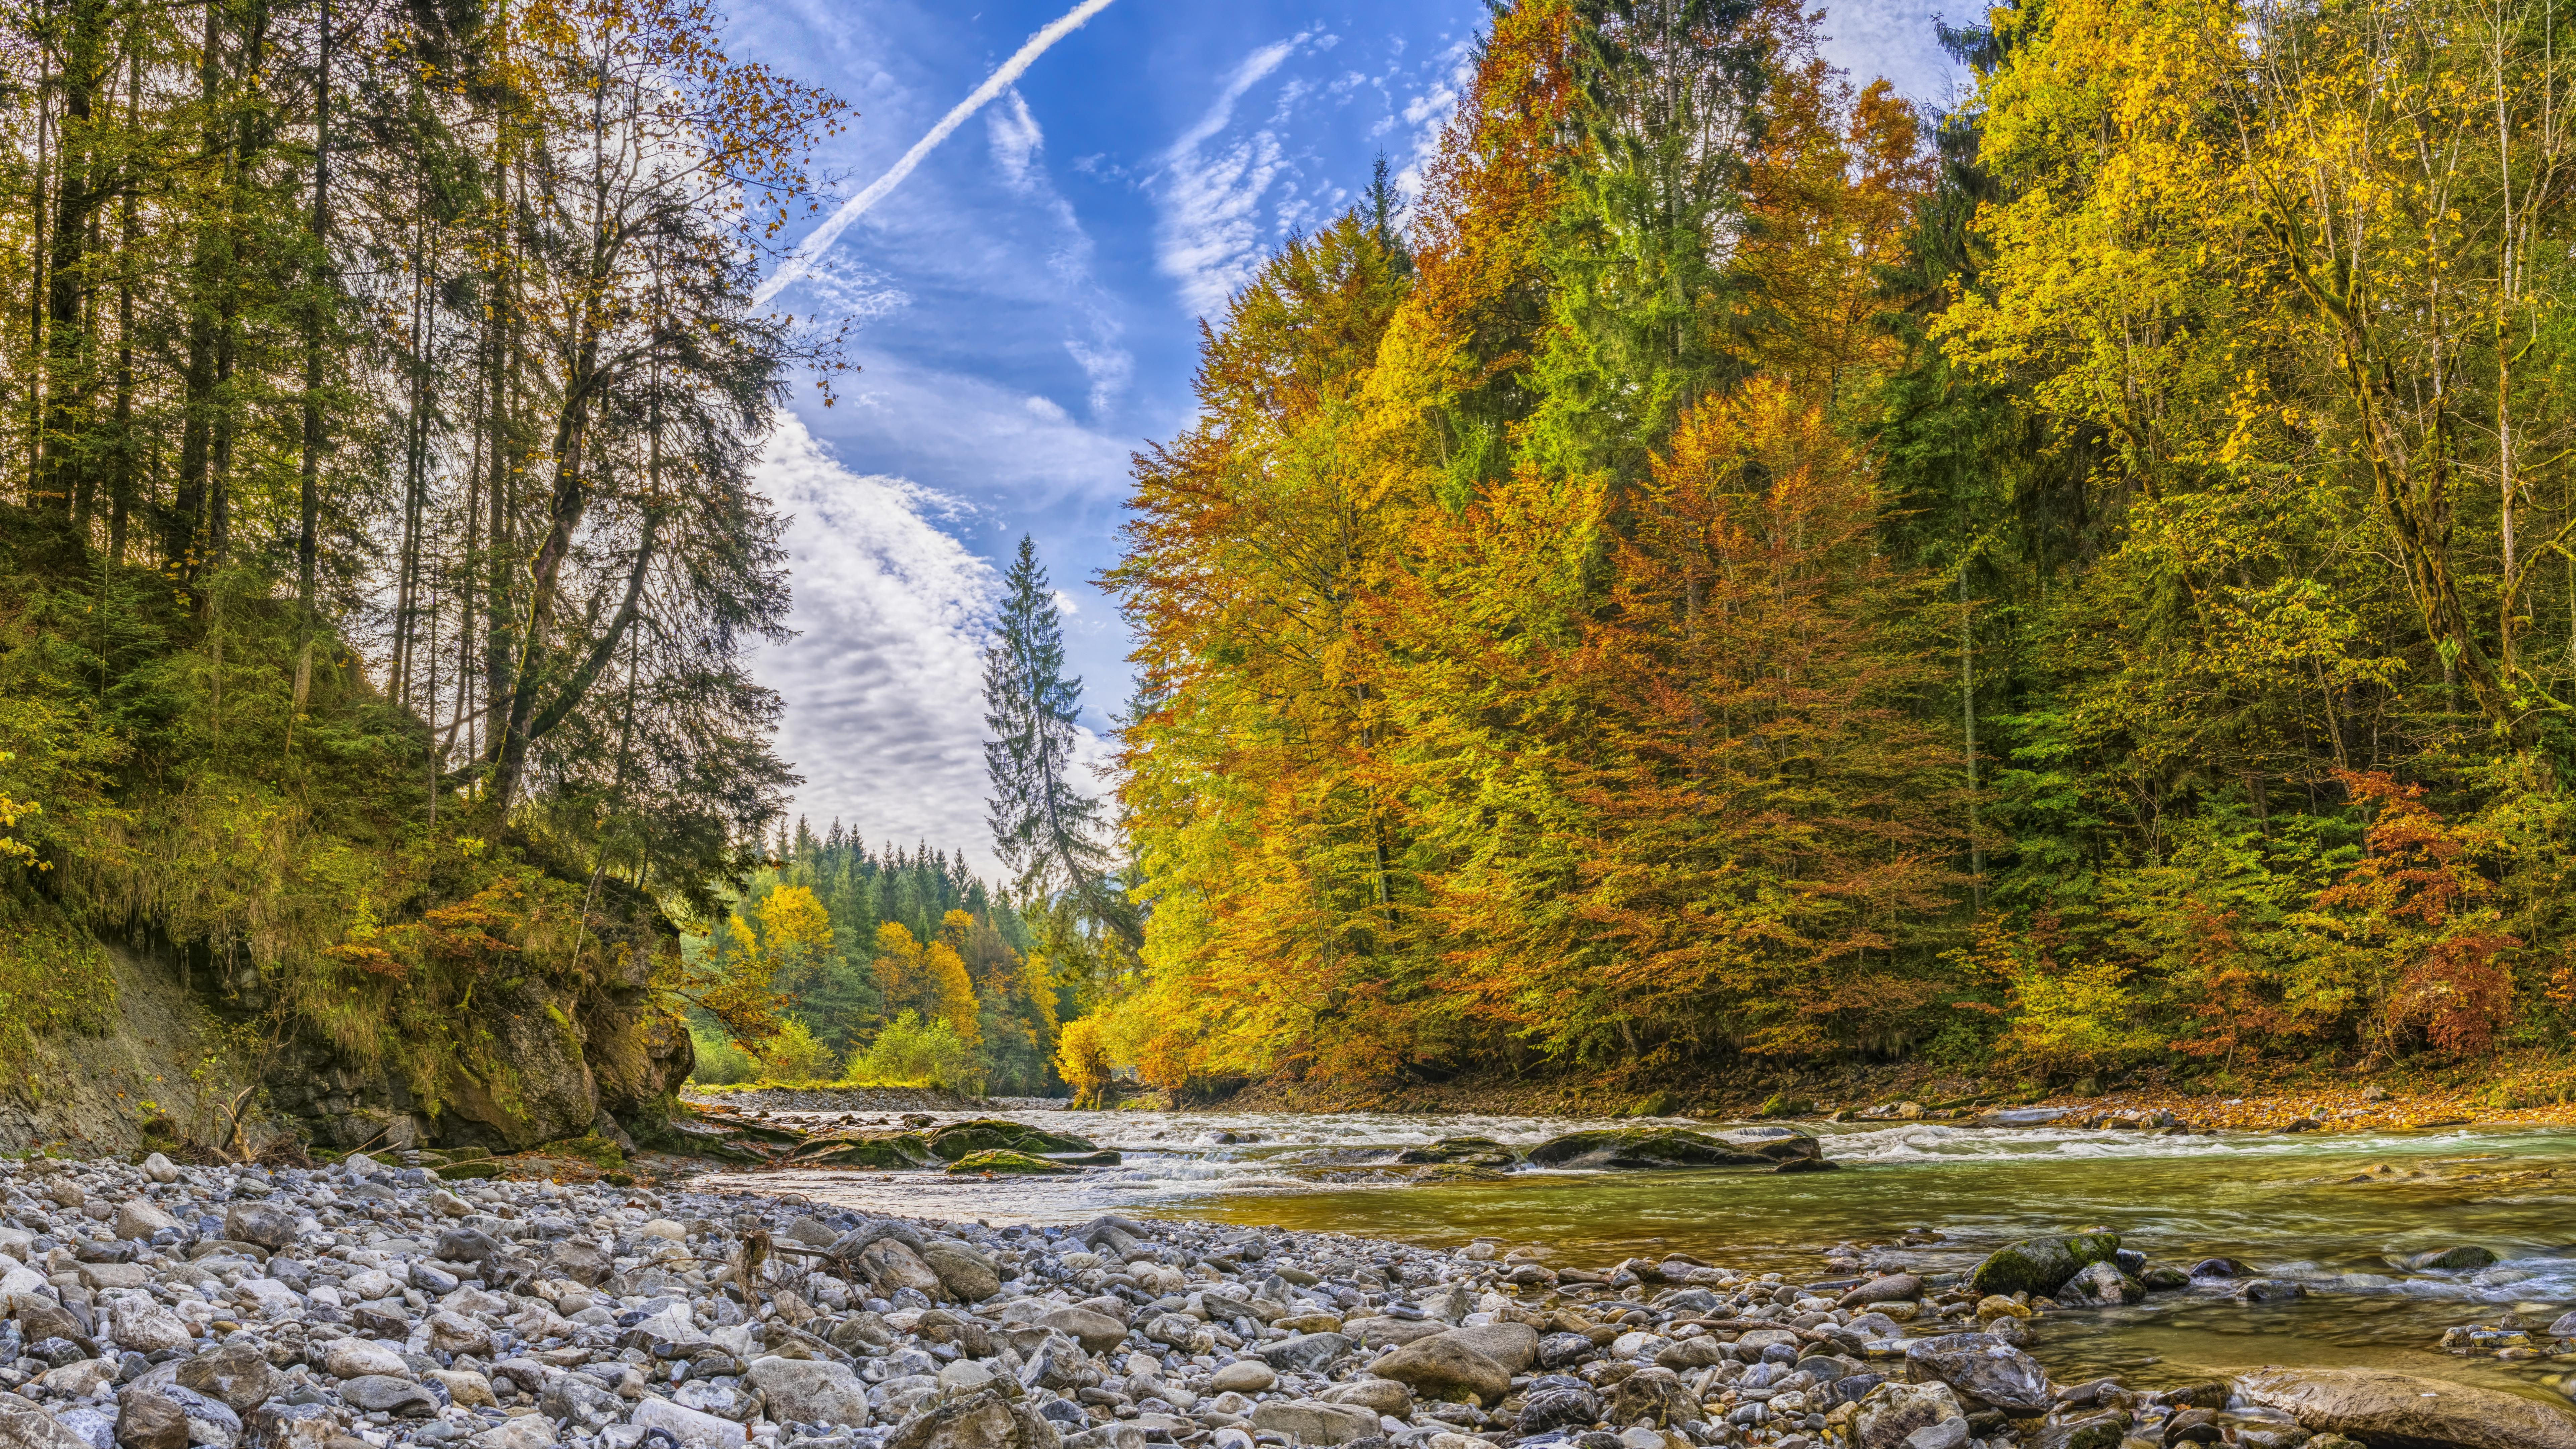 River In Autumn Forest 8k Ultrahd Wallpaper Backiee